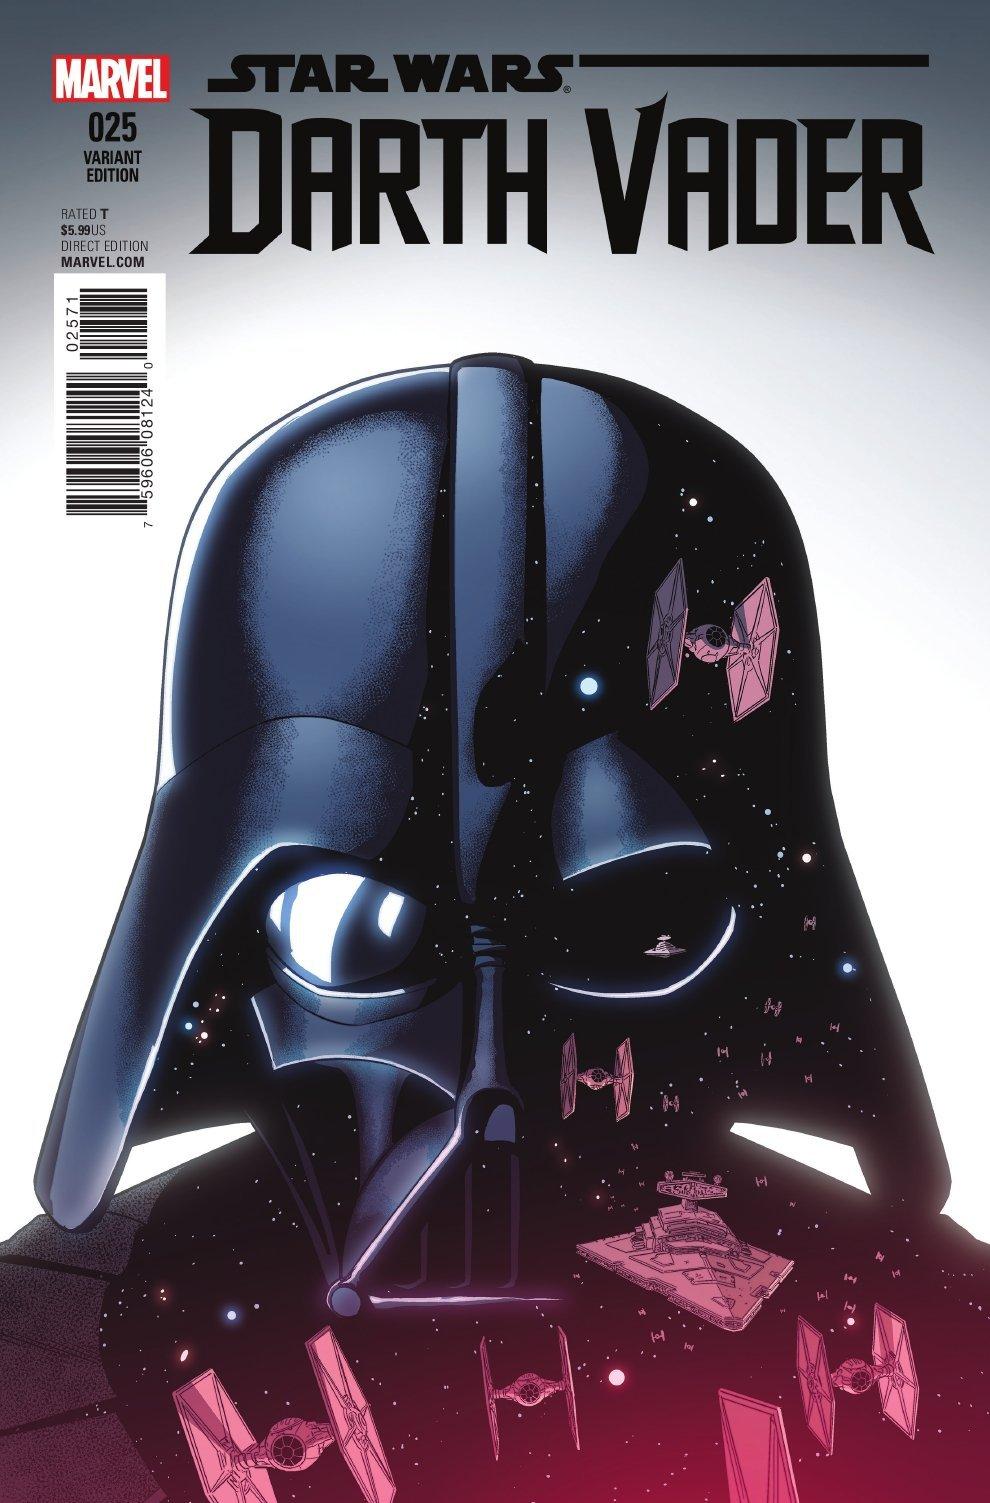 Darth Vader #25 (Jamie McKelvie Variant Cover) (12.10.2016)